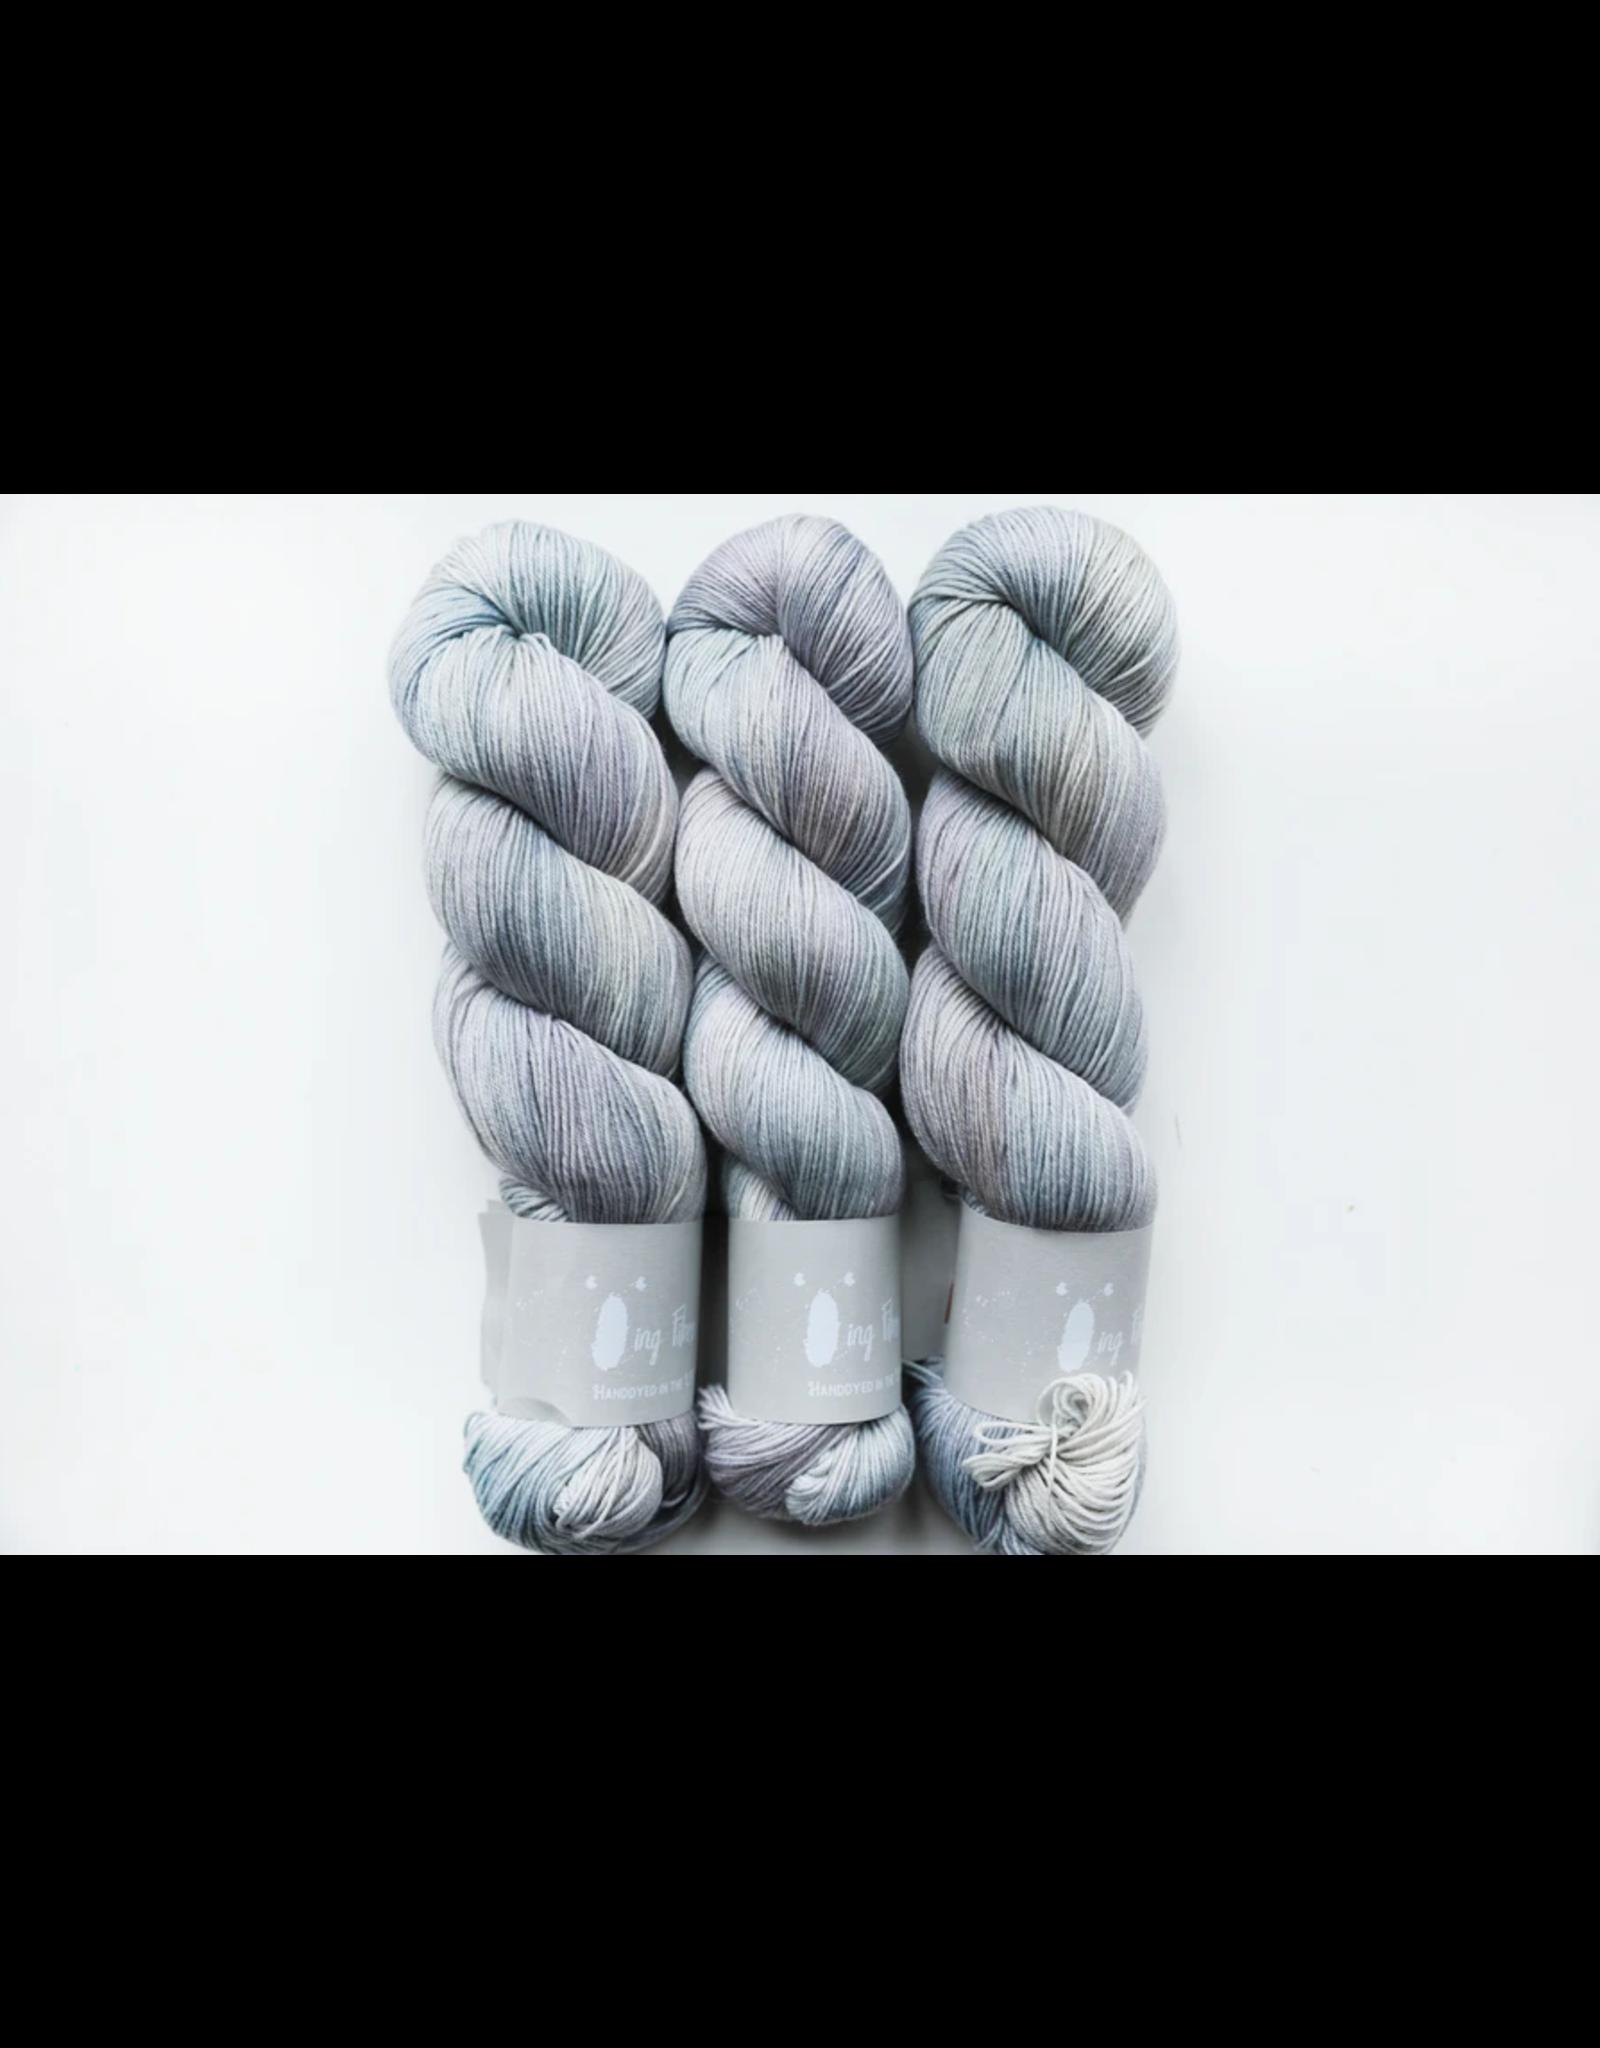 Qing Fibre Titanium - Merino Single - Qing Fibre